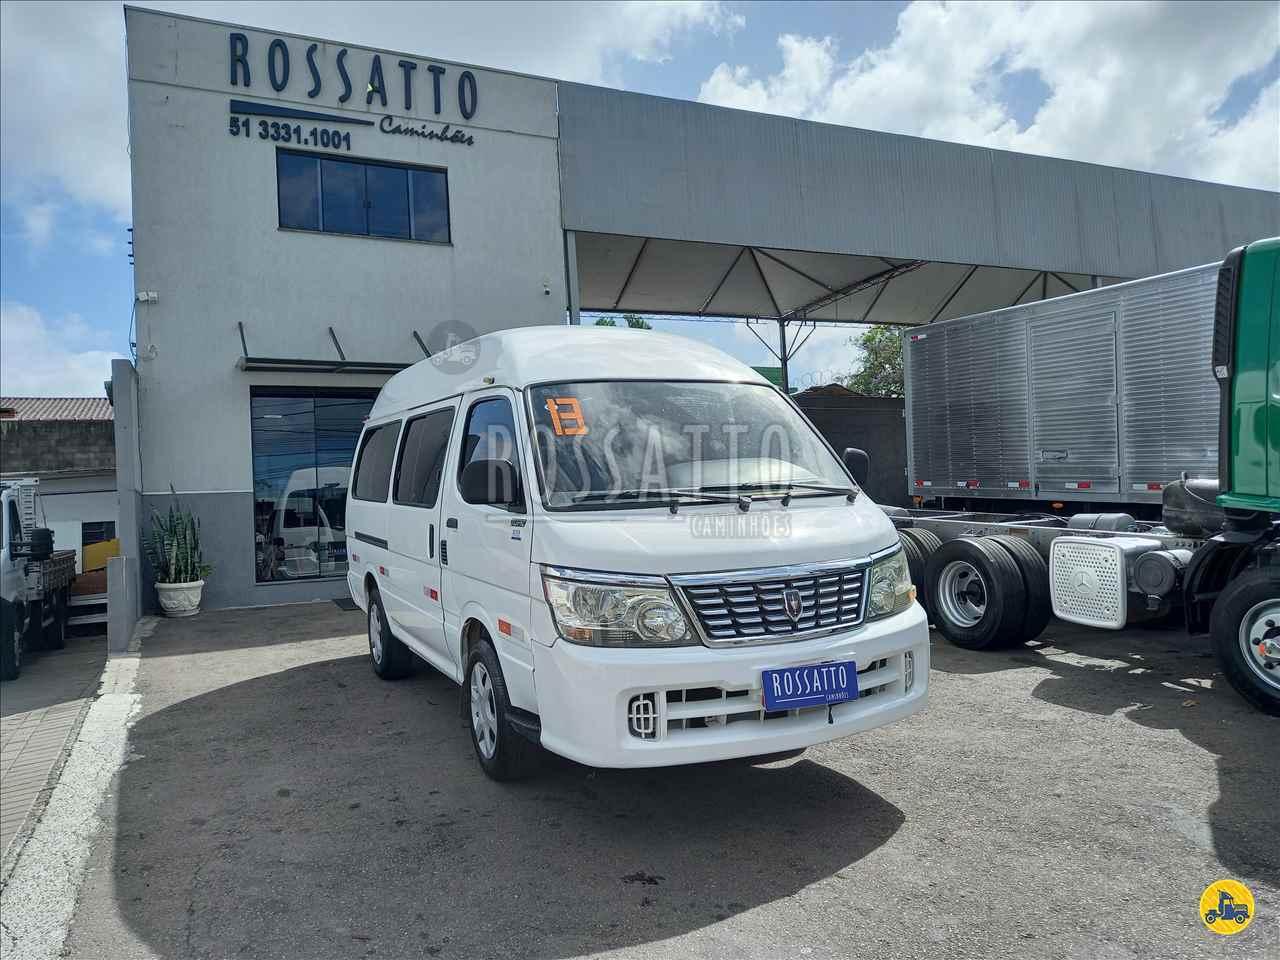 VANS JINBEI Topic Van SL 2.2 Rossatto Caminhões PORTO ALEGRE RIO GRANDE DO SUL RS